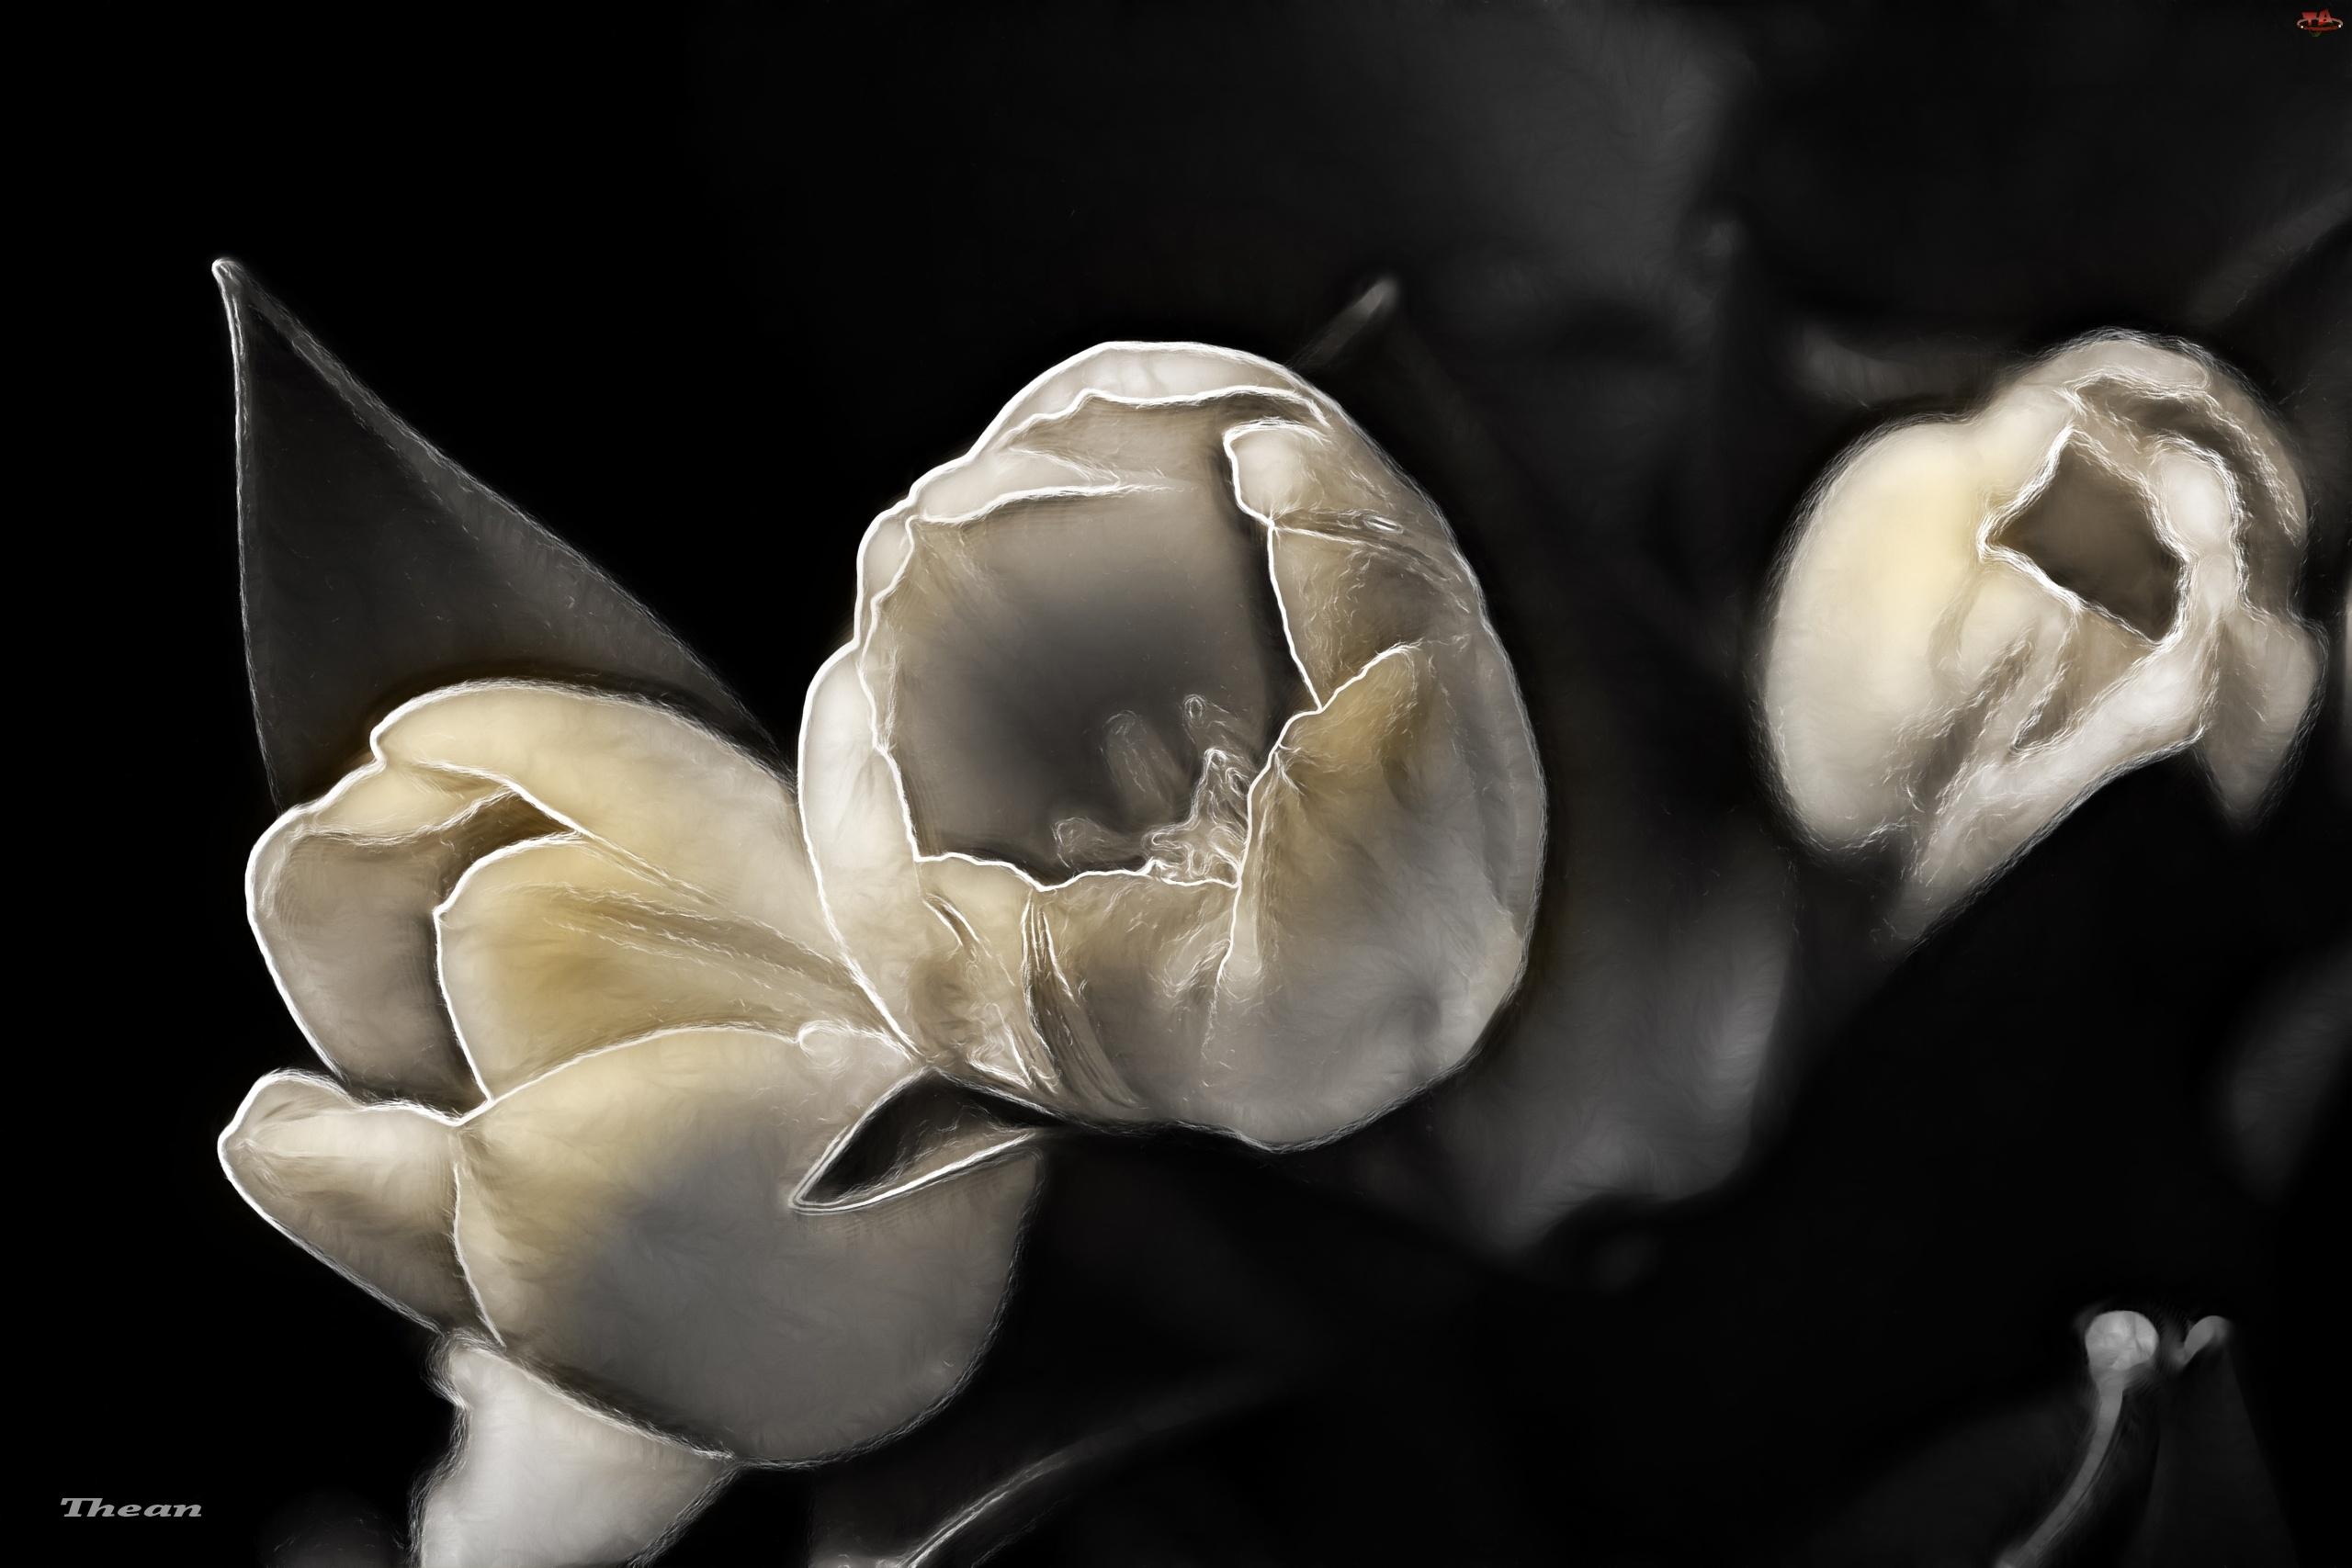 Tulipany, Fractalius